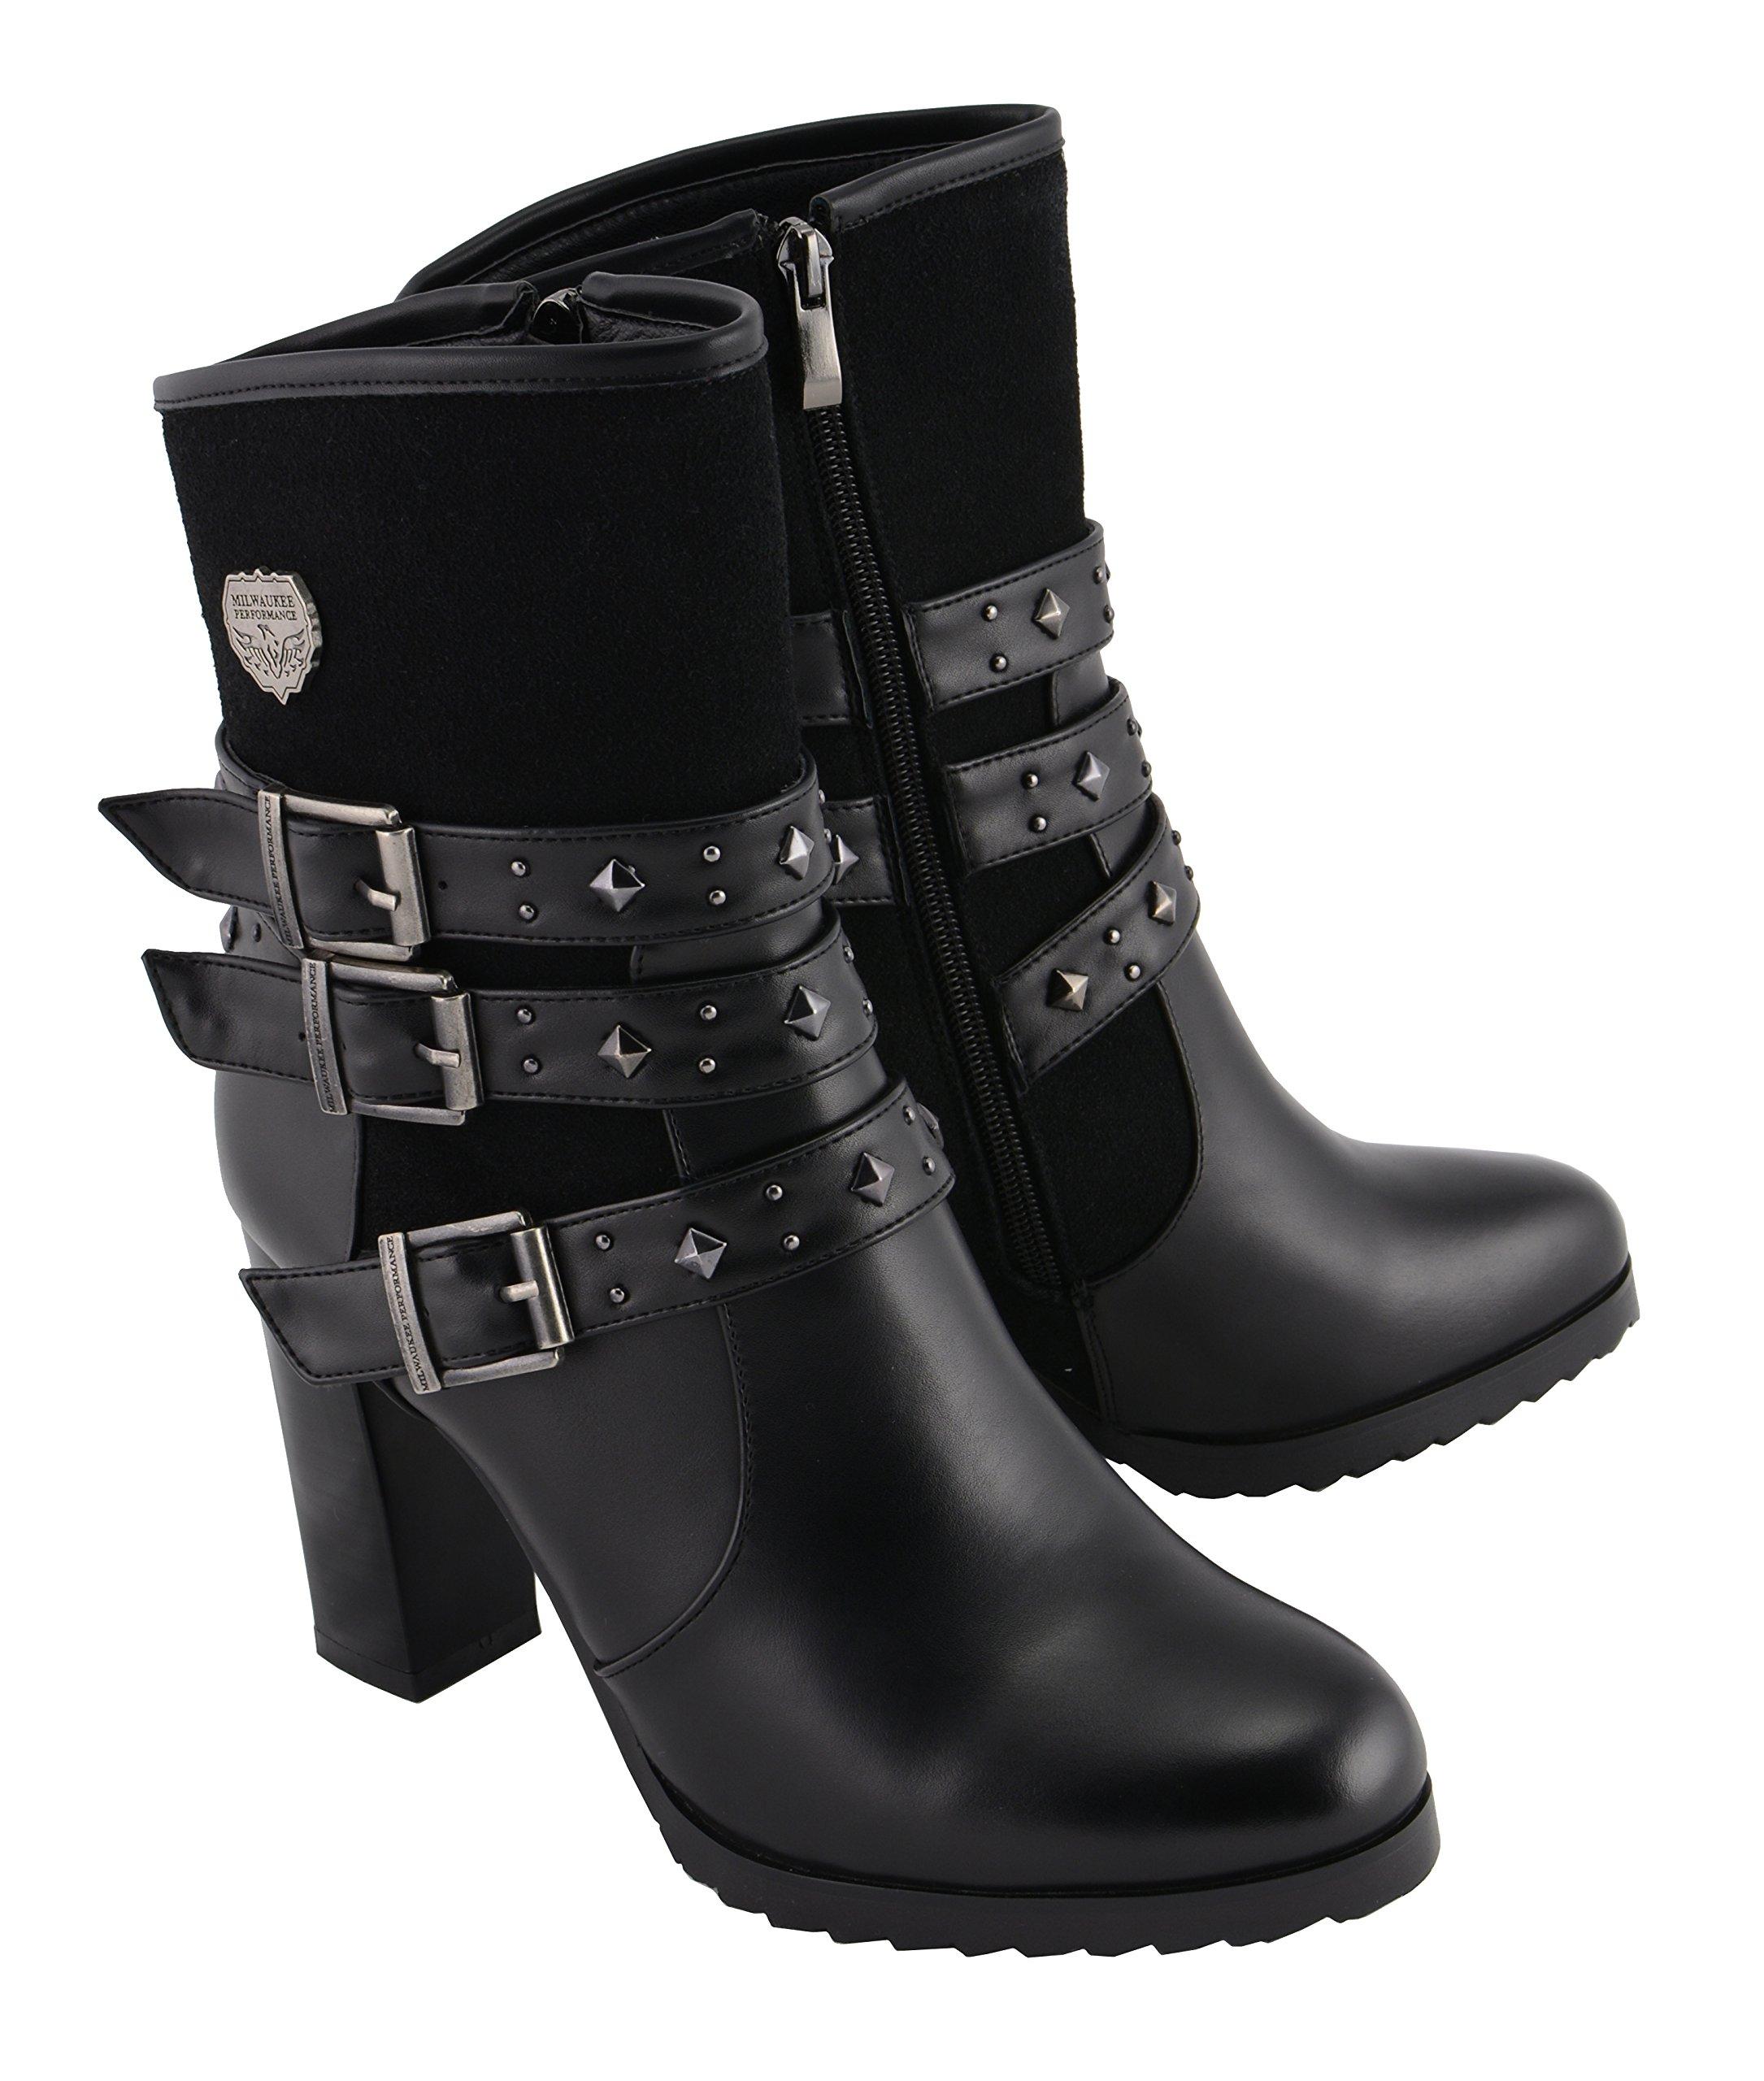 Milwaukee Performance Women's Riding Boot with Block Heel (Black, 8)